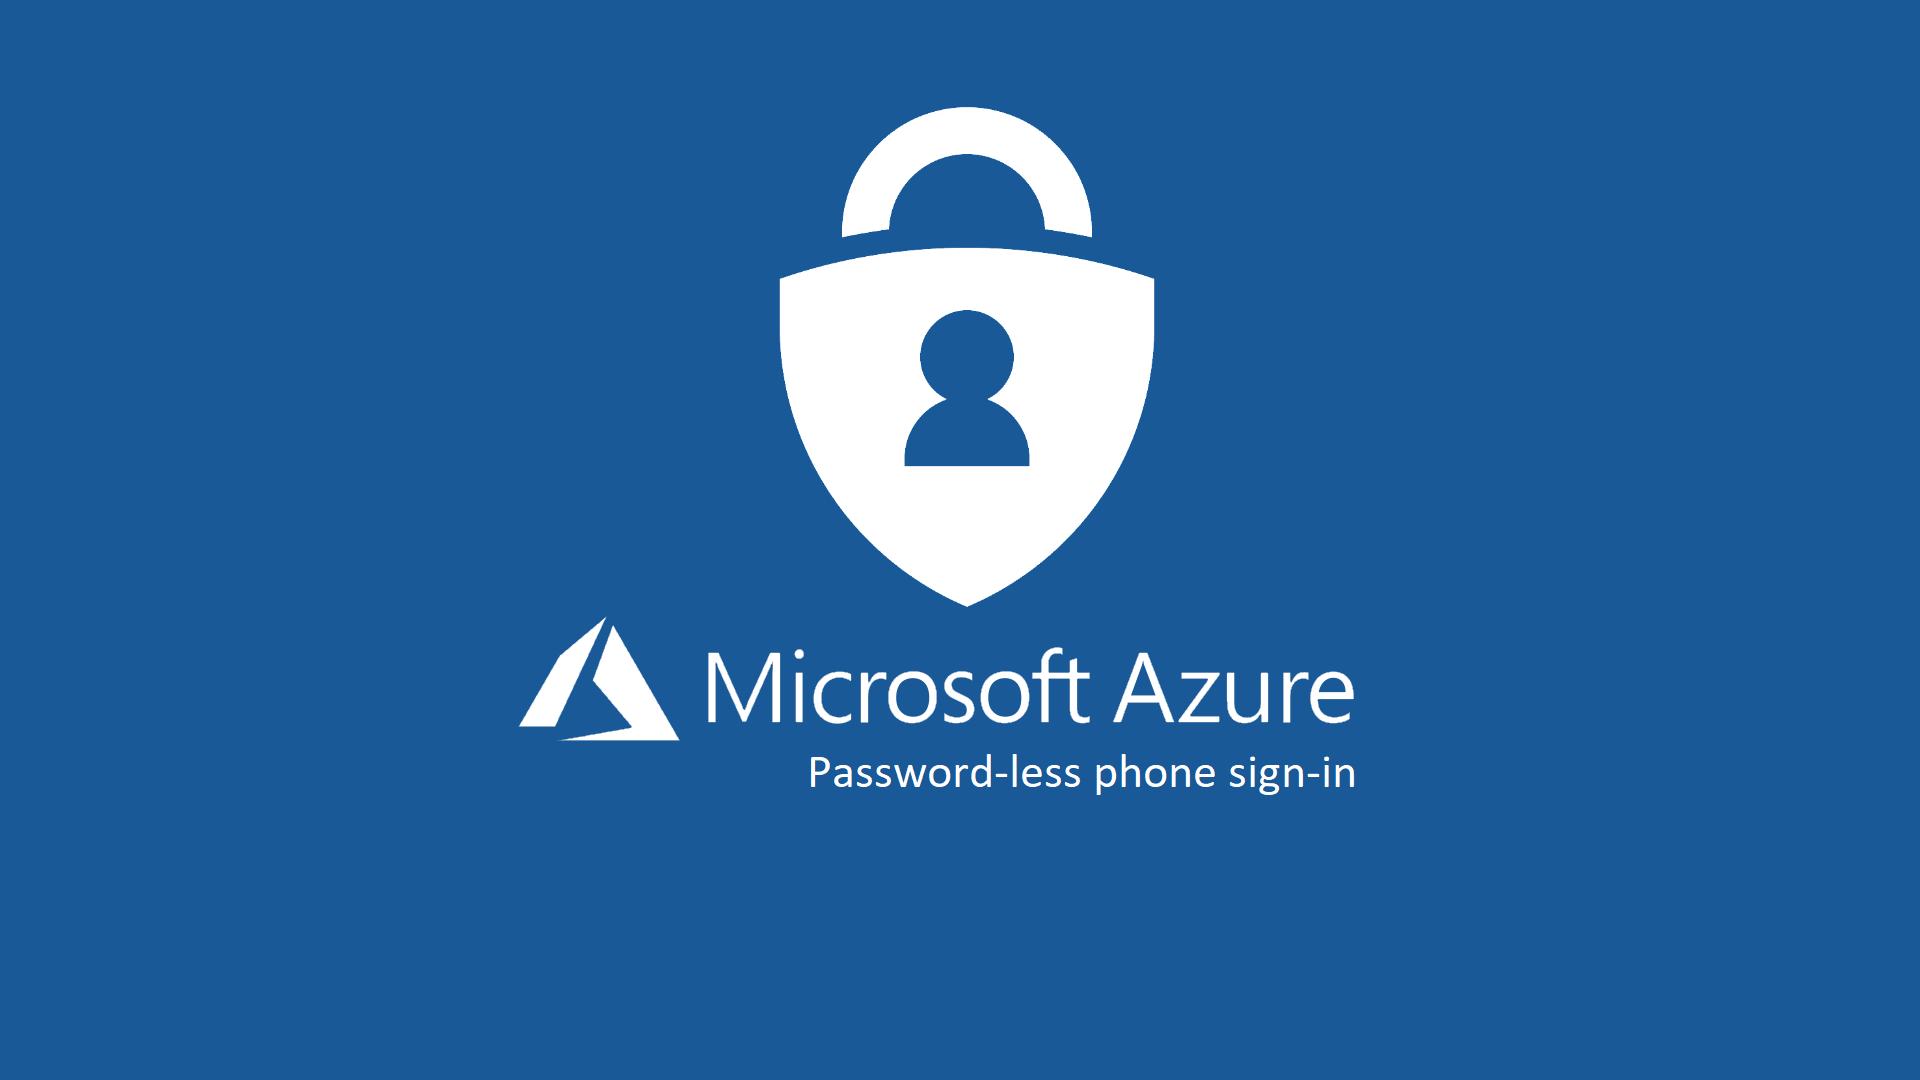 Password-less phone sign-in utilizzando l'app Microsoft